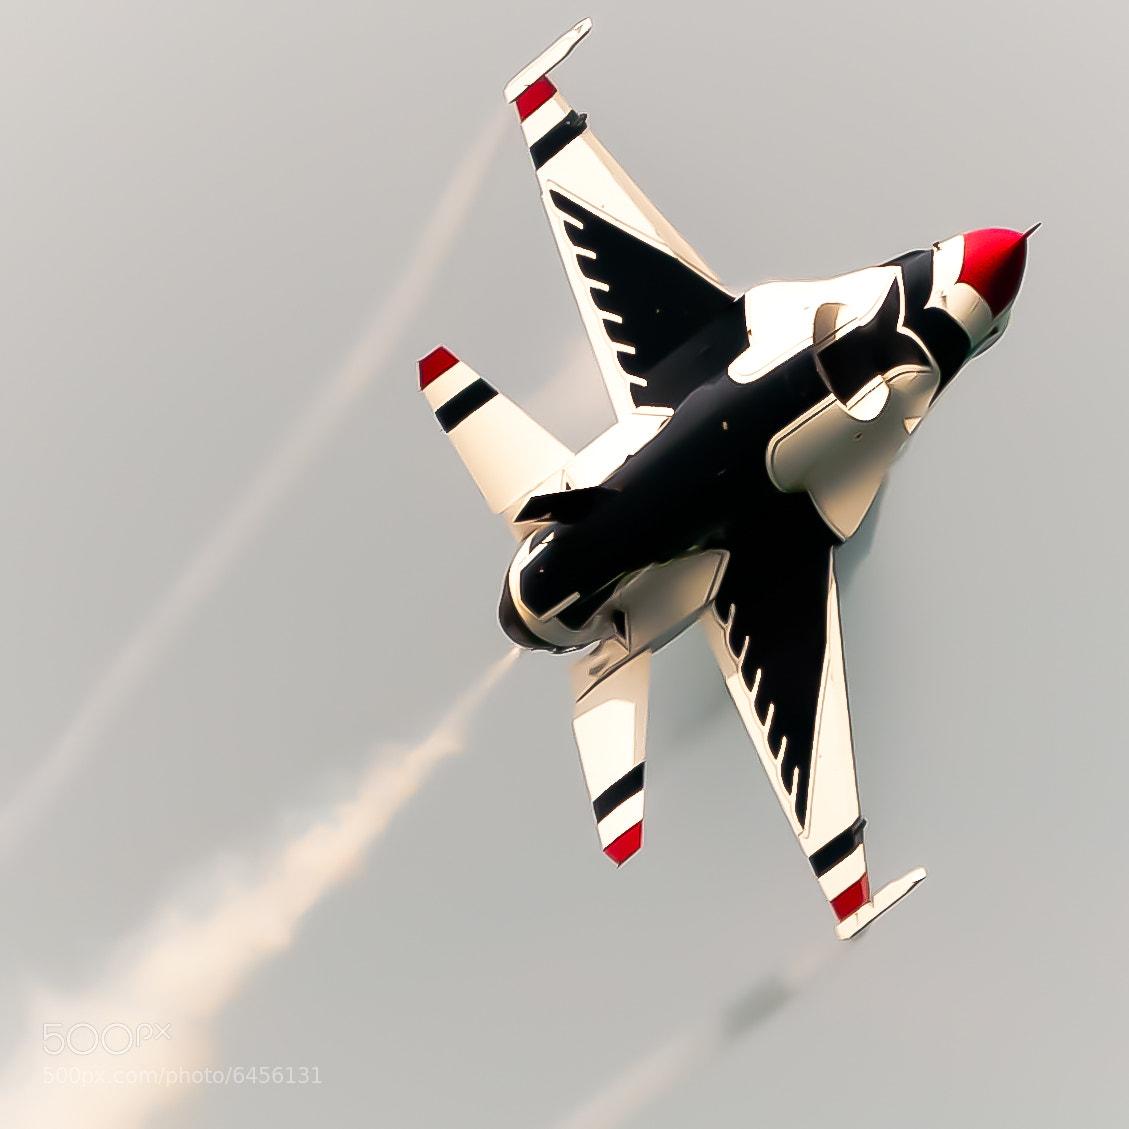 Photograph Thunderbird by John Harrison on 500px